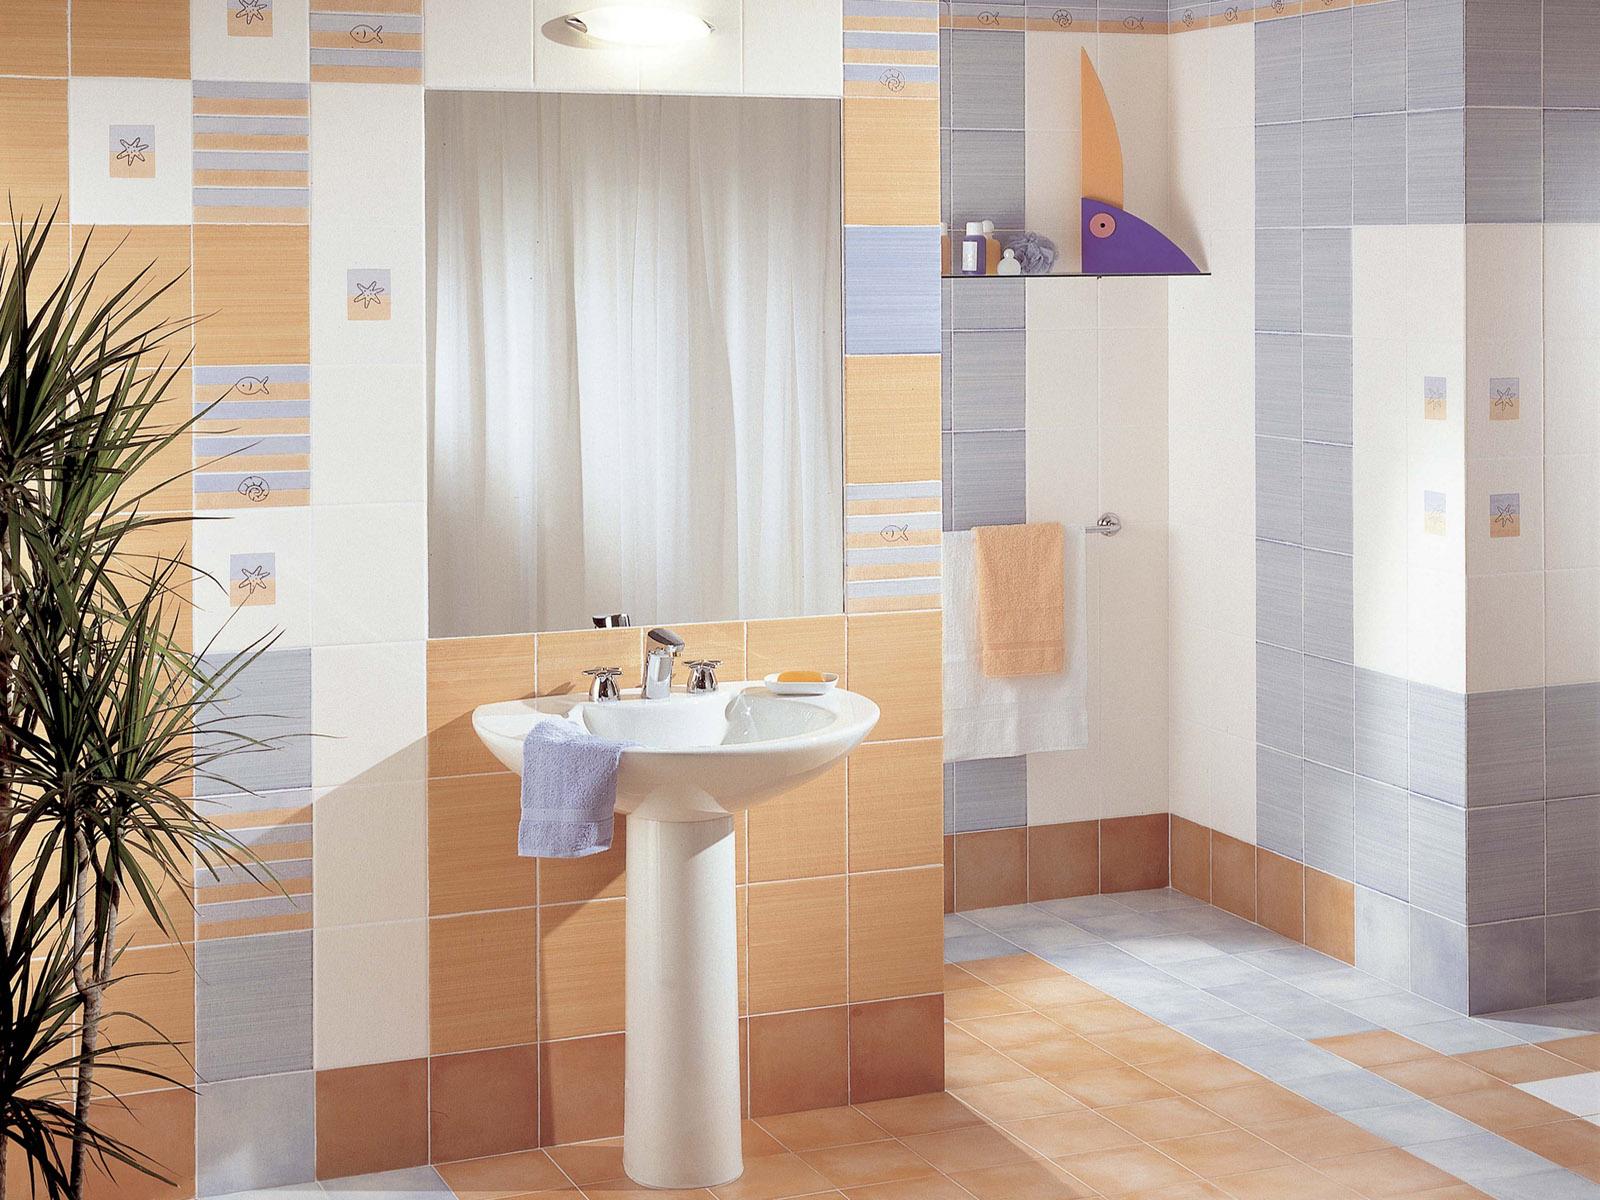 Neat Teen Bathroom Design | Interior design ideas